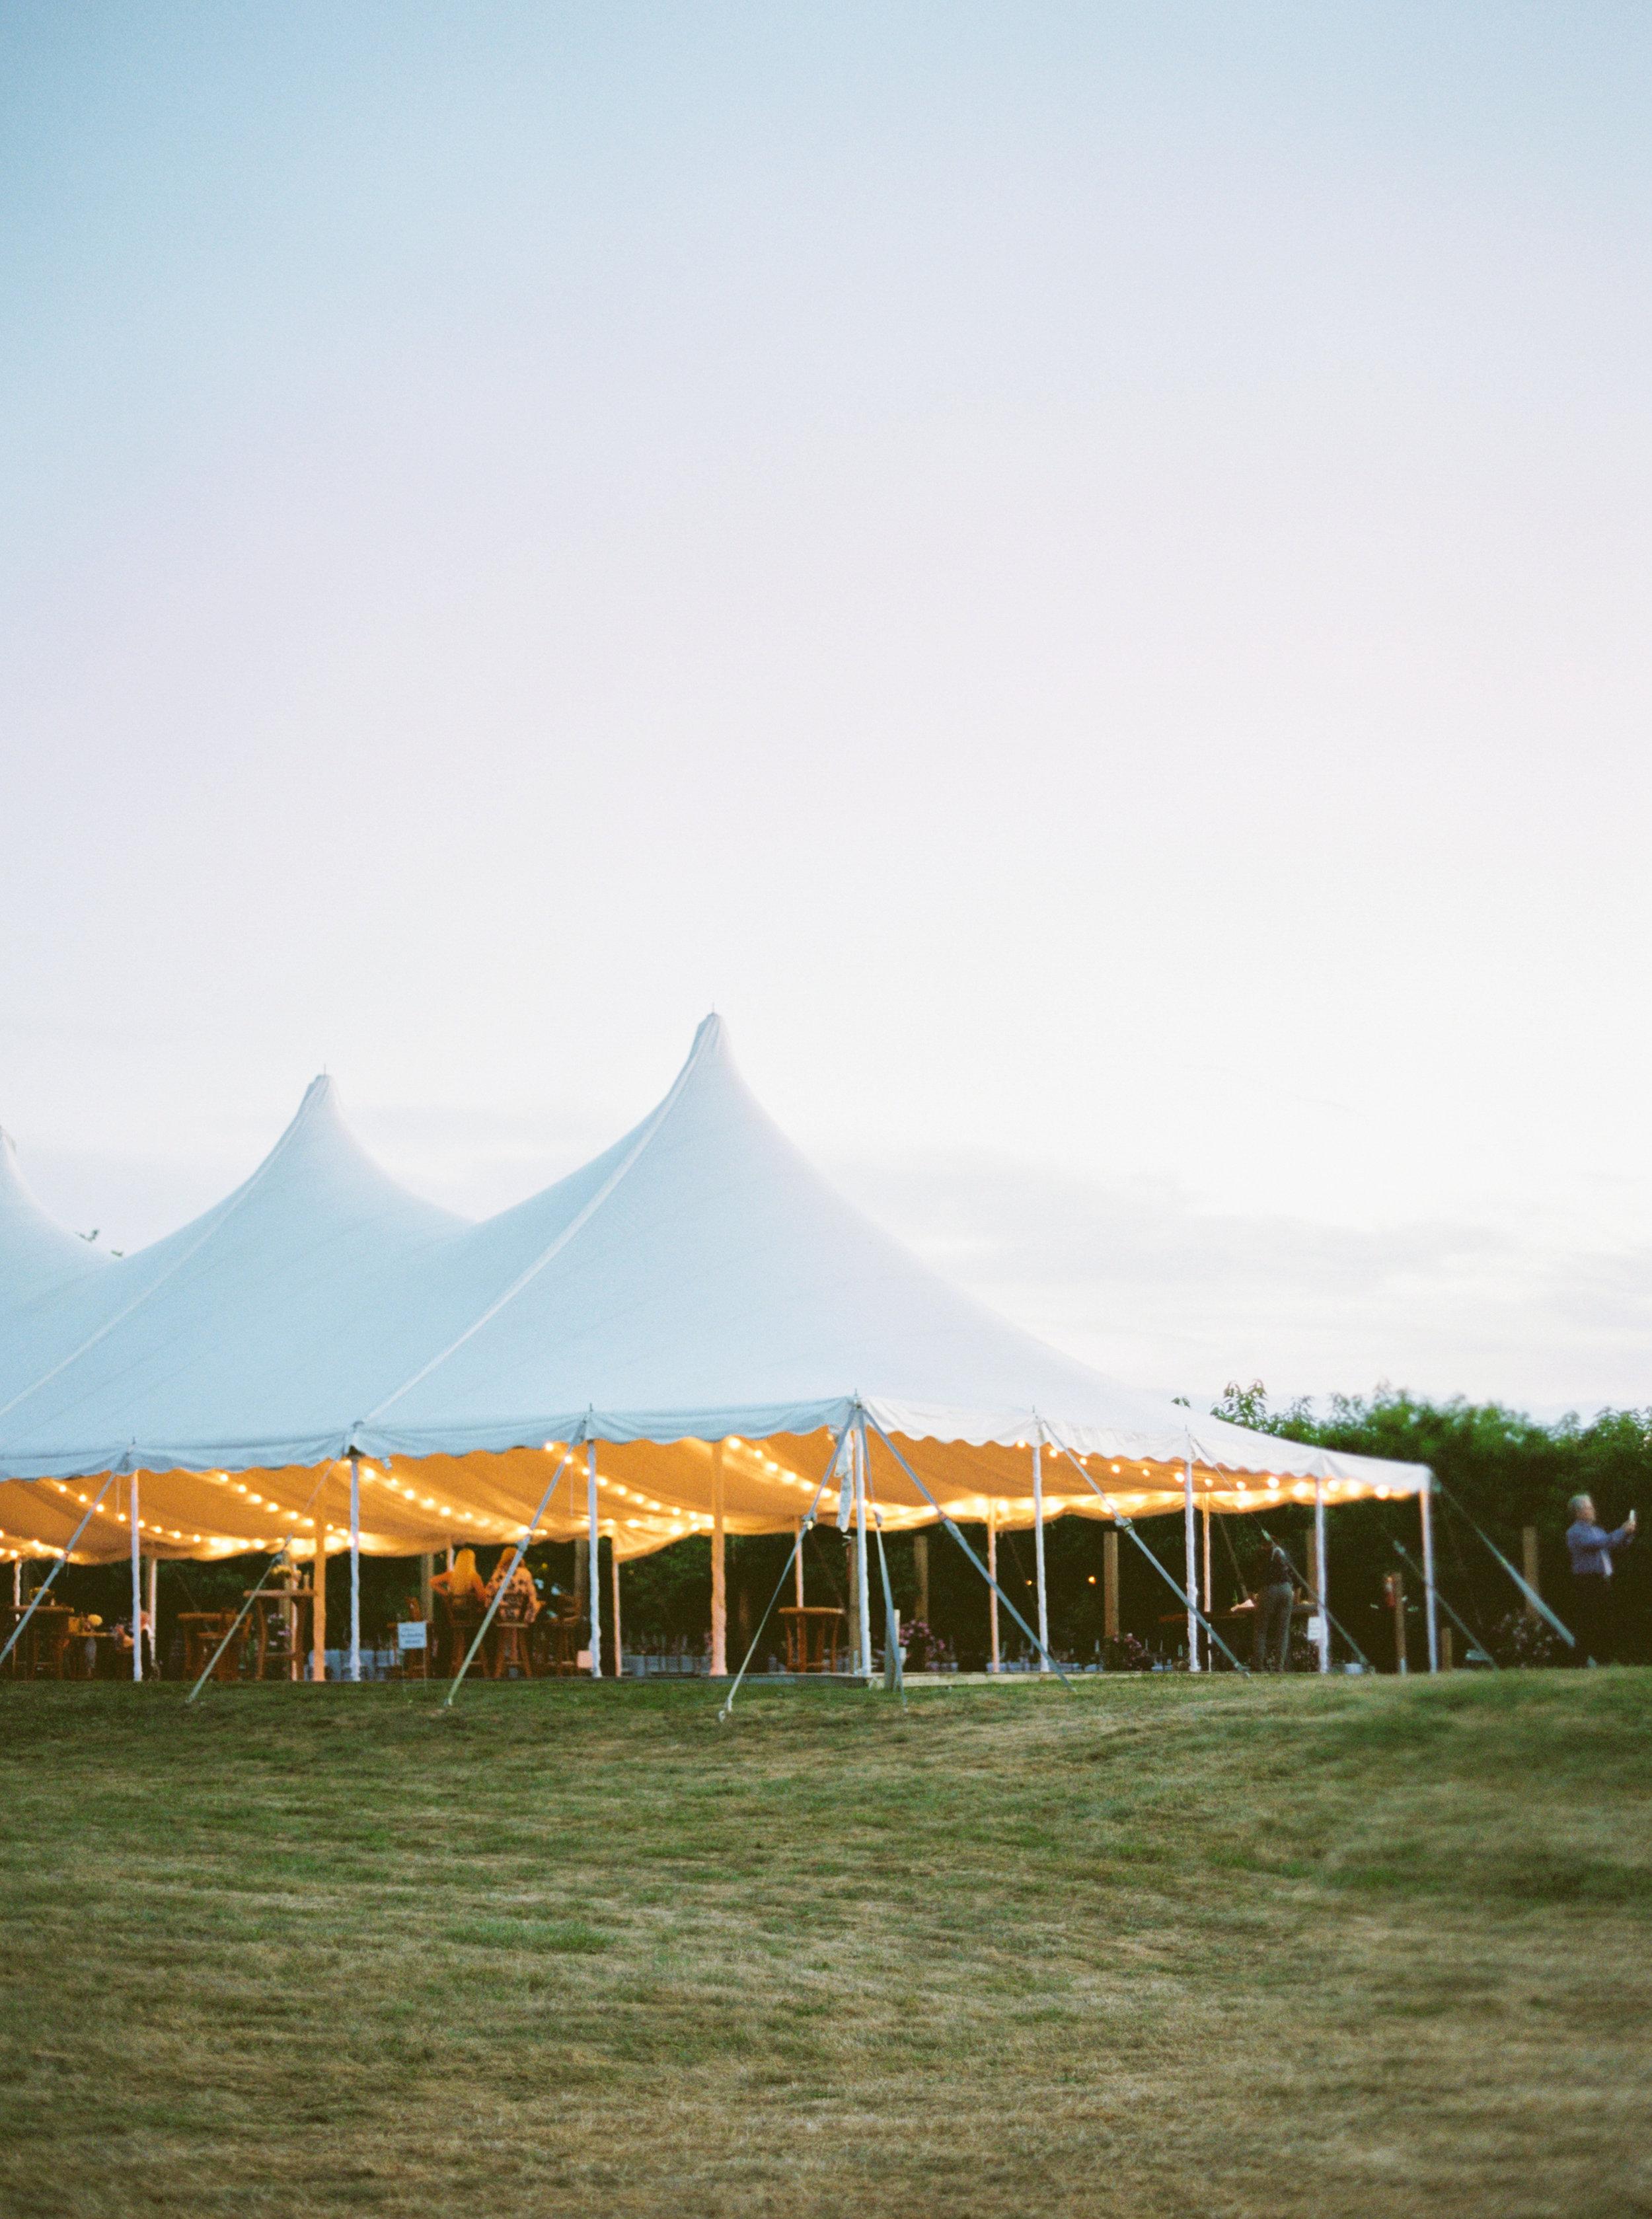 gracewood-kurtz-orchards-toronto-wedding-photographer-kurtz-film-richelle-hunter-cassandra-zac-dalpe-previews-4.jpg